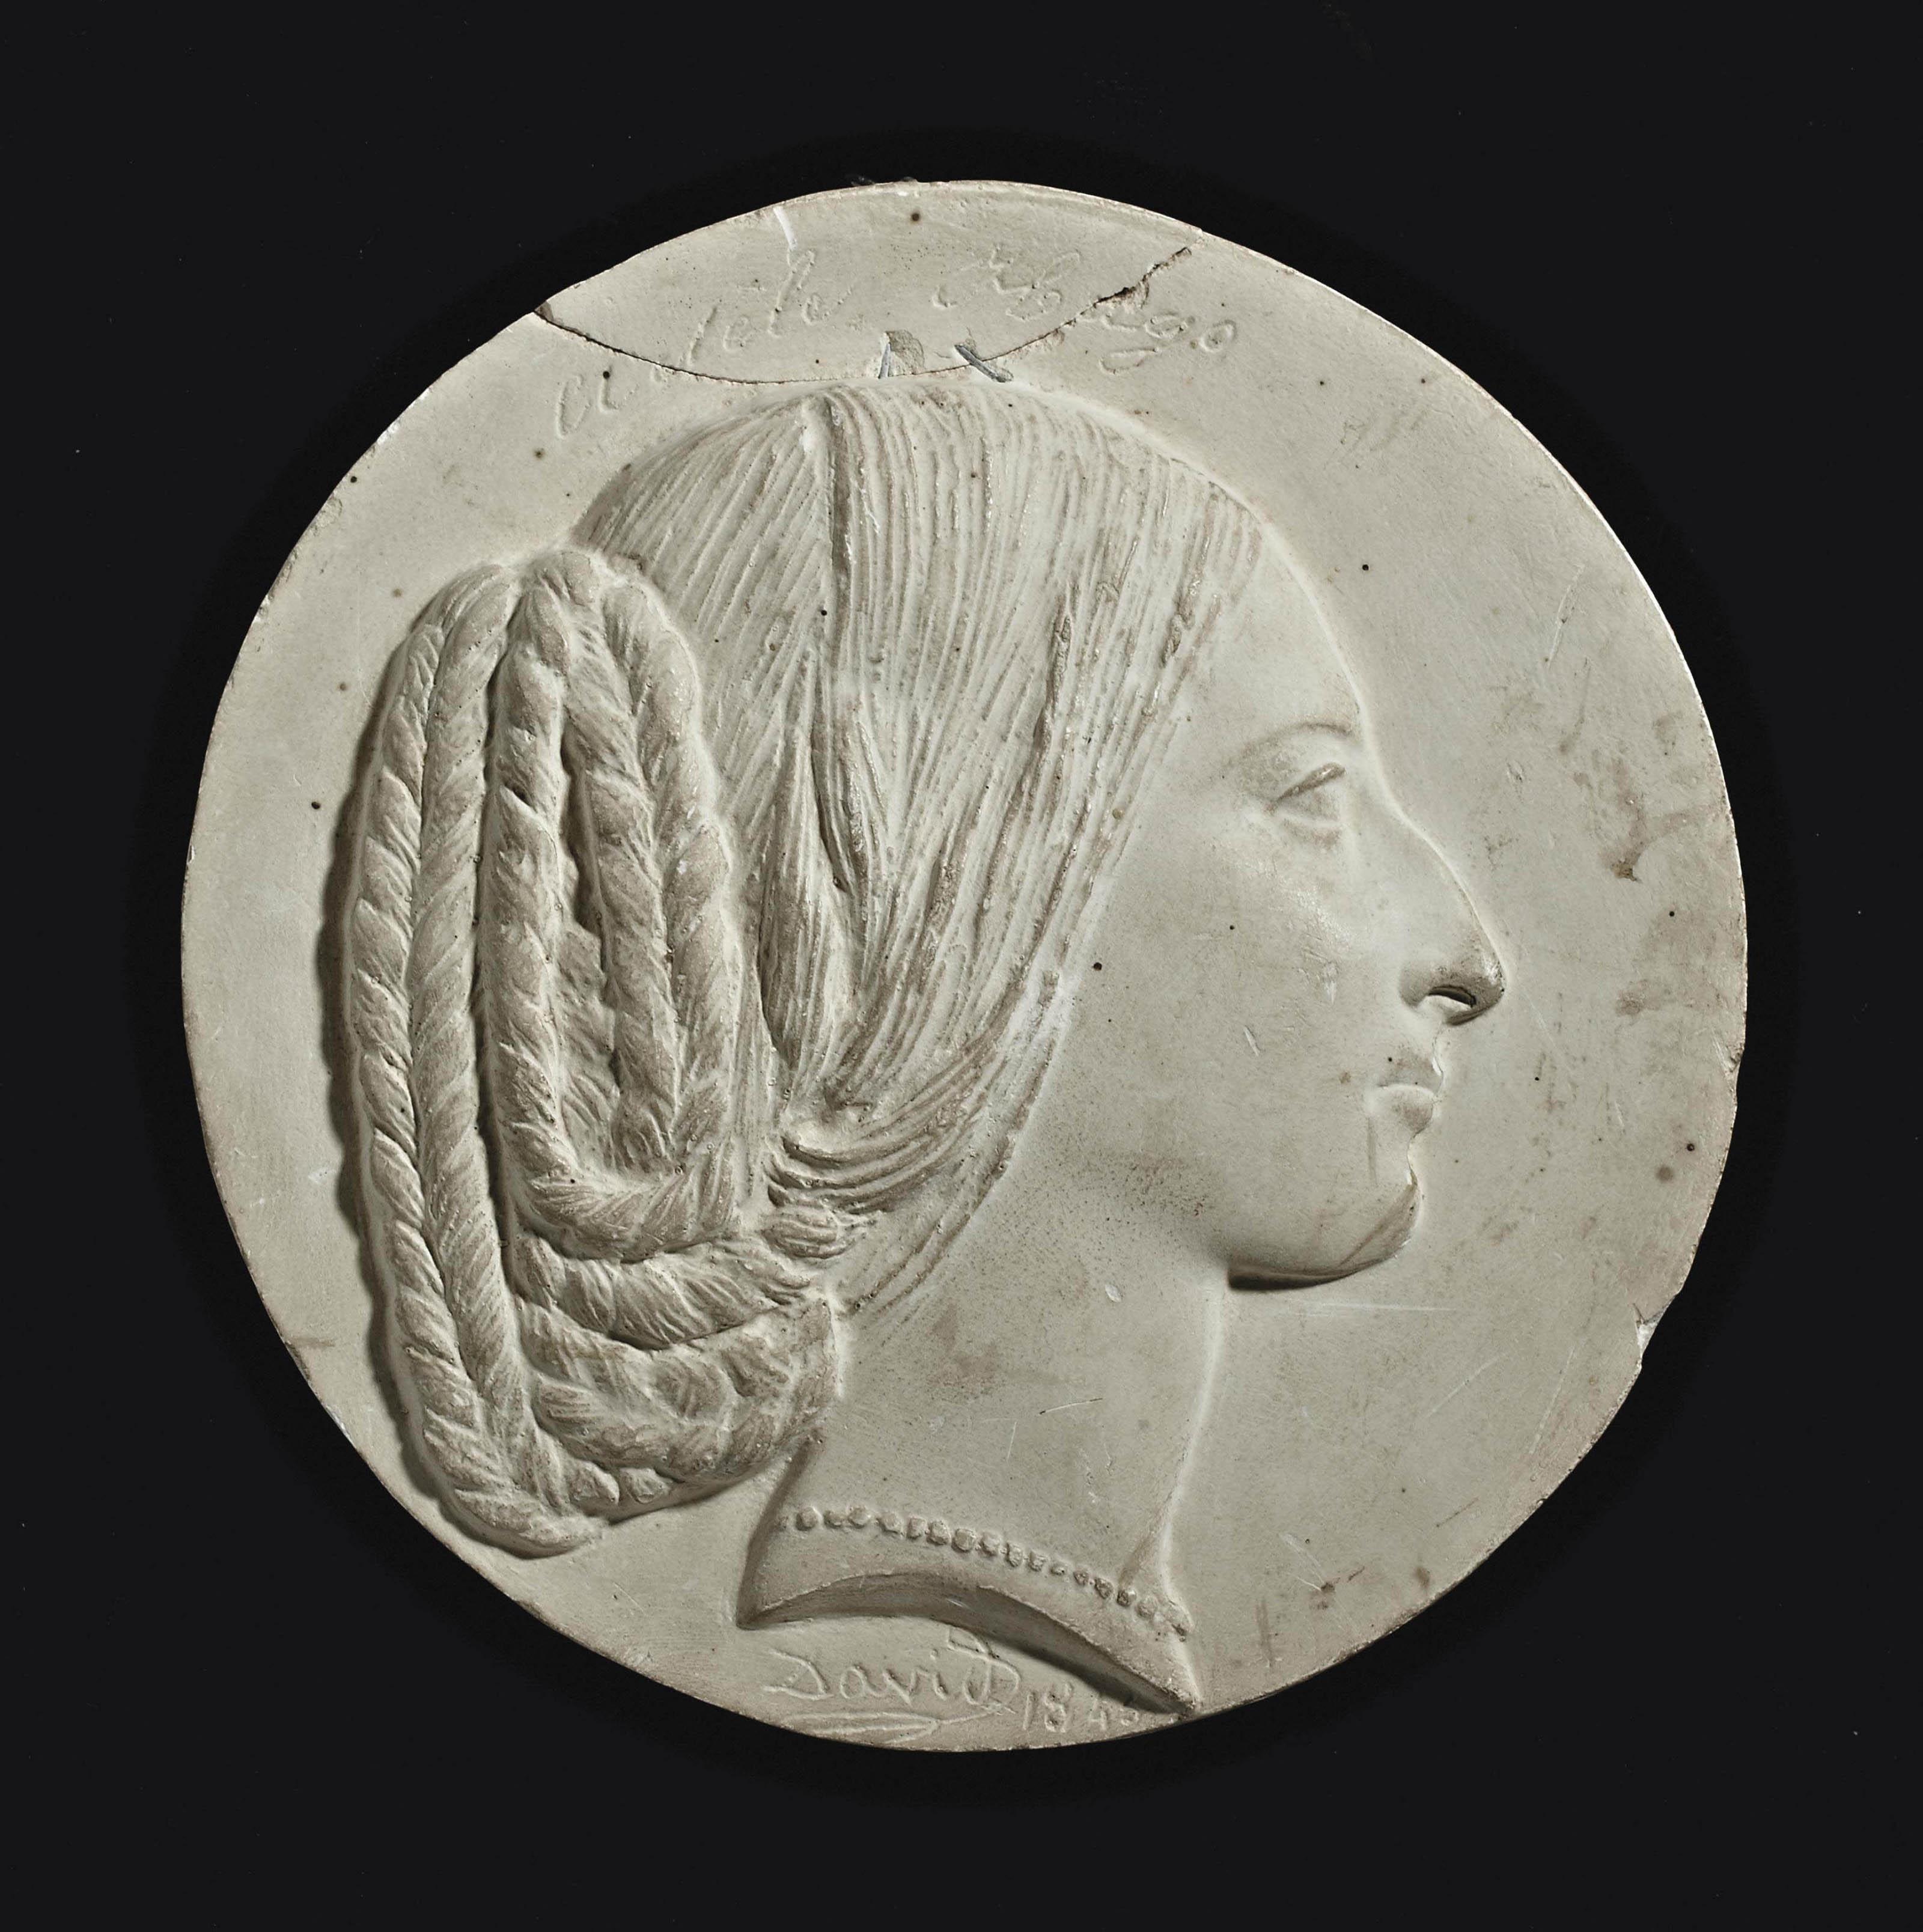 PORTRAIT EN PLATRE REPRESENTANT MLLE ADELE HUGO (1830-1915)